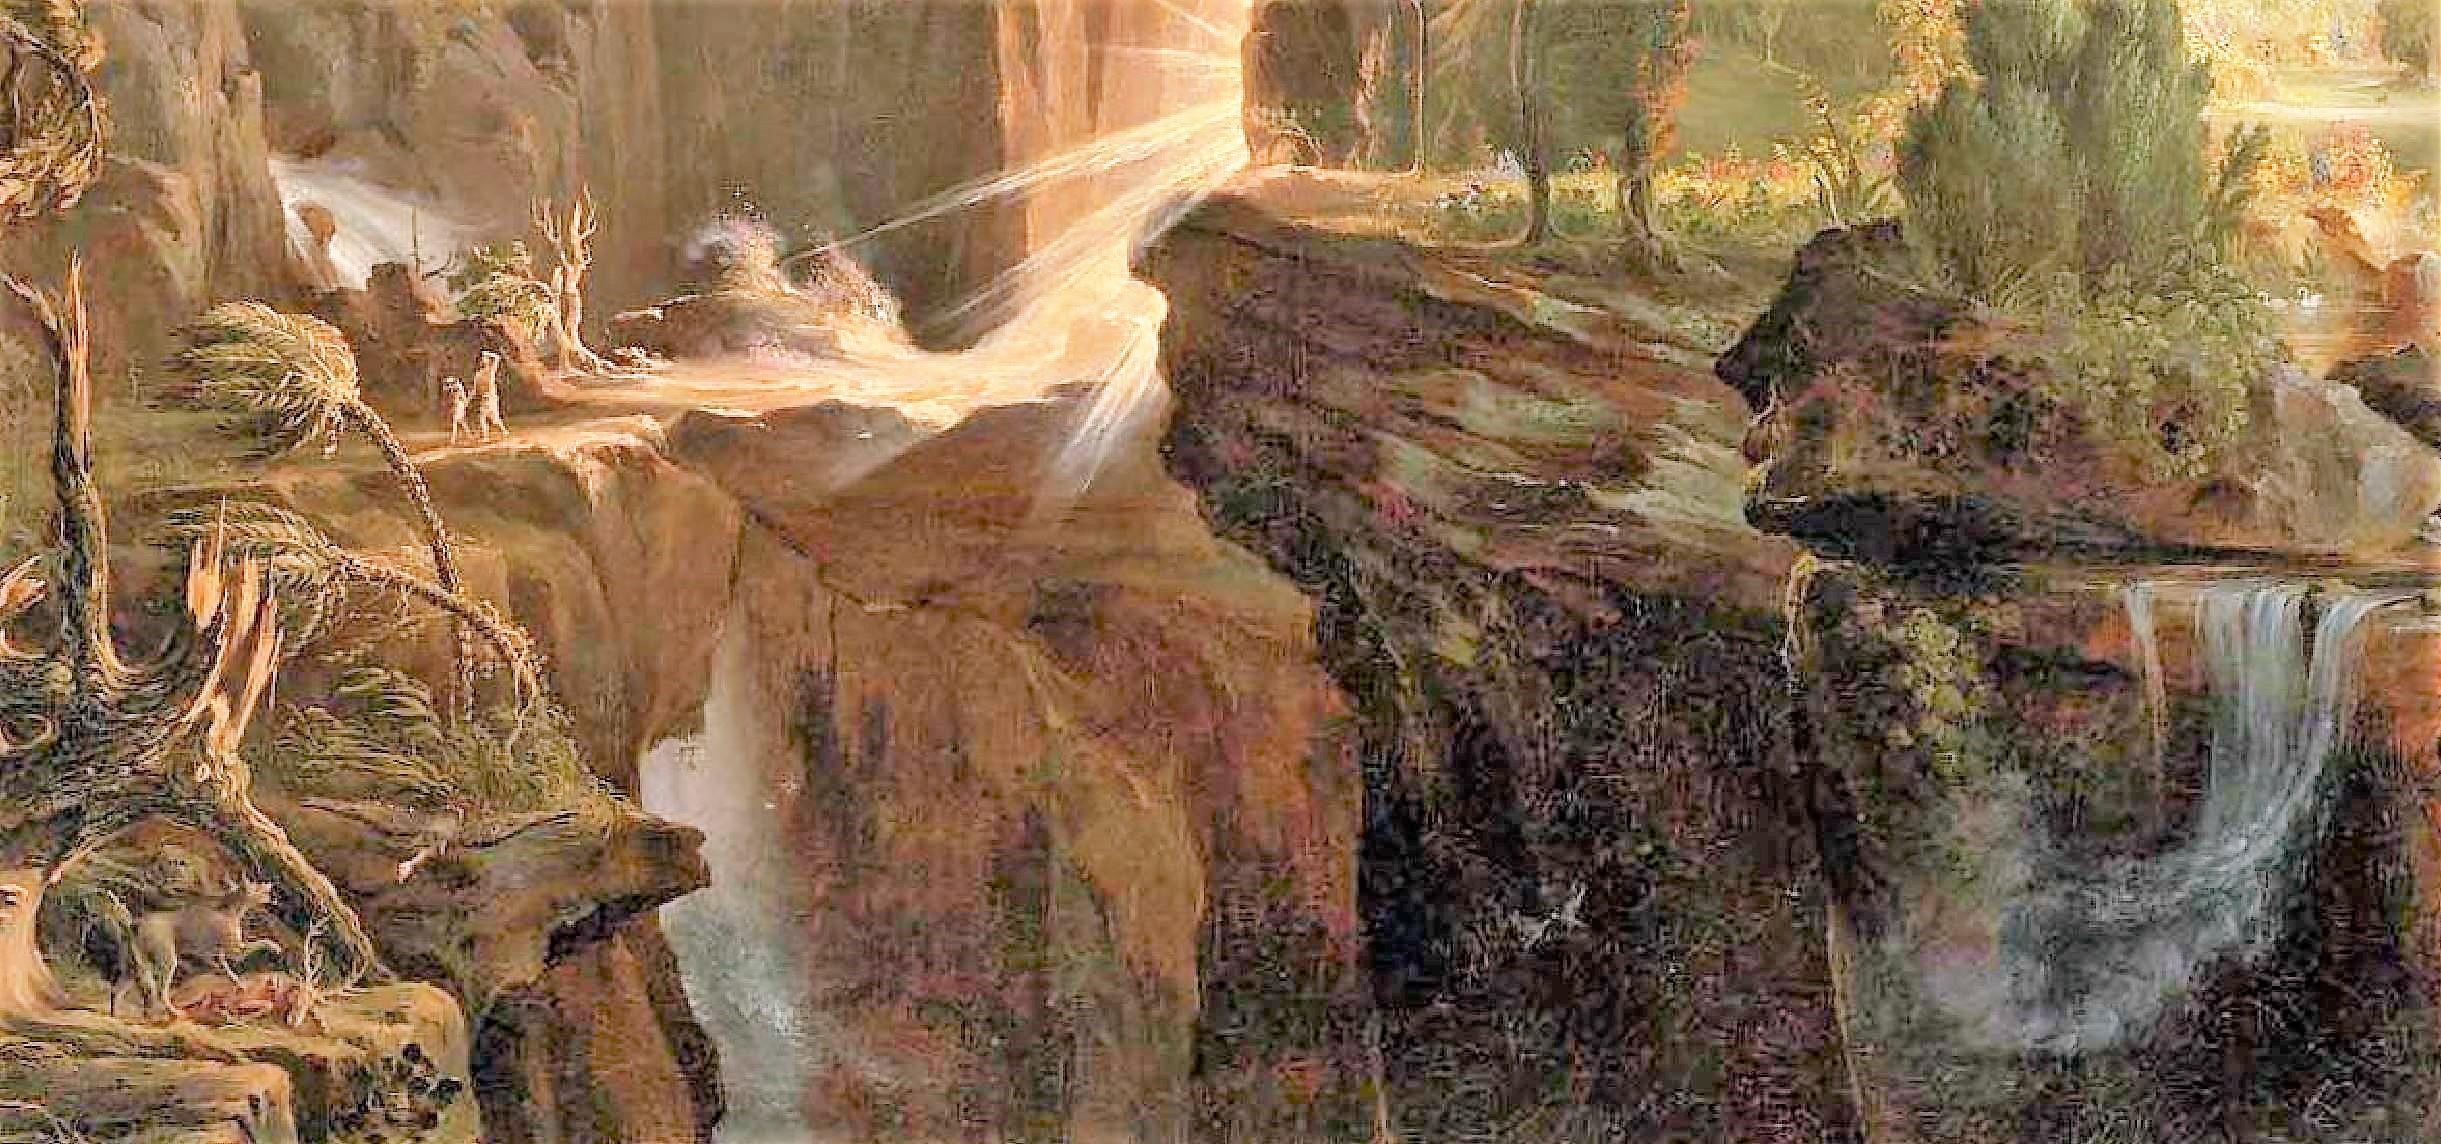 Cole 1828 Expulsion from The_Garden_of_Eden_, Museum of Fine Arts, Boston 100.96 cm × 138.43 cm detal eau